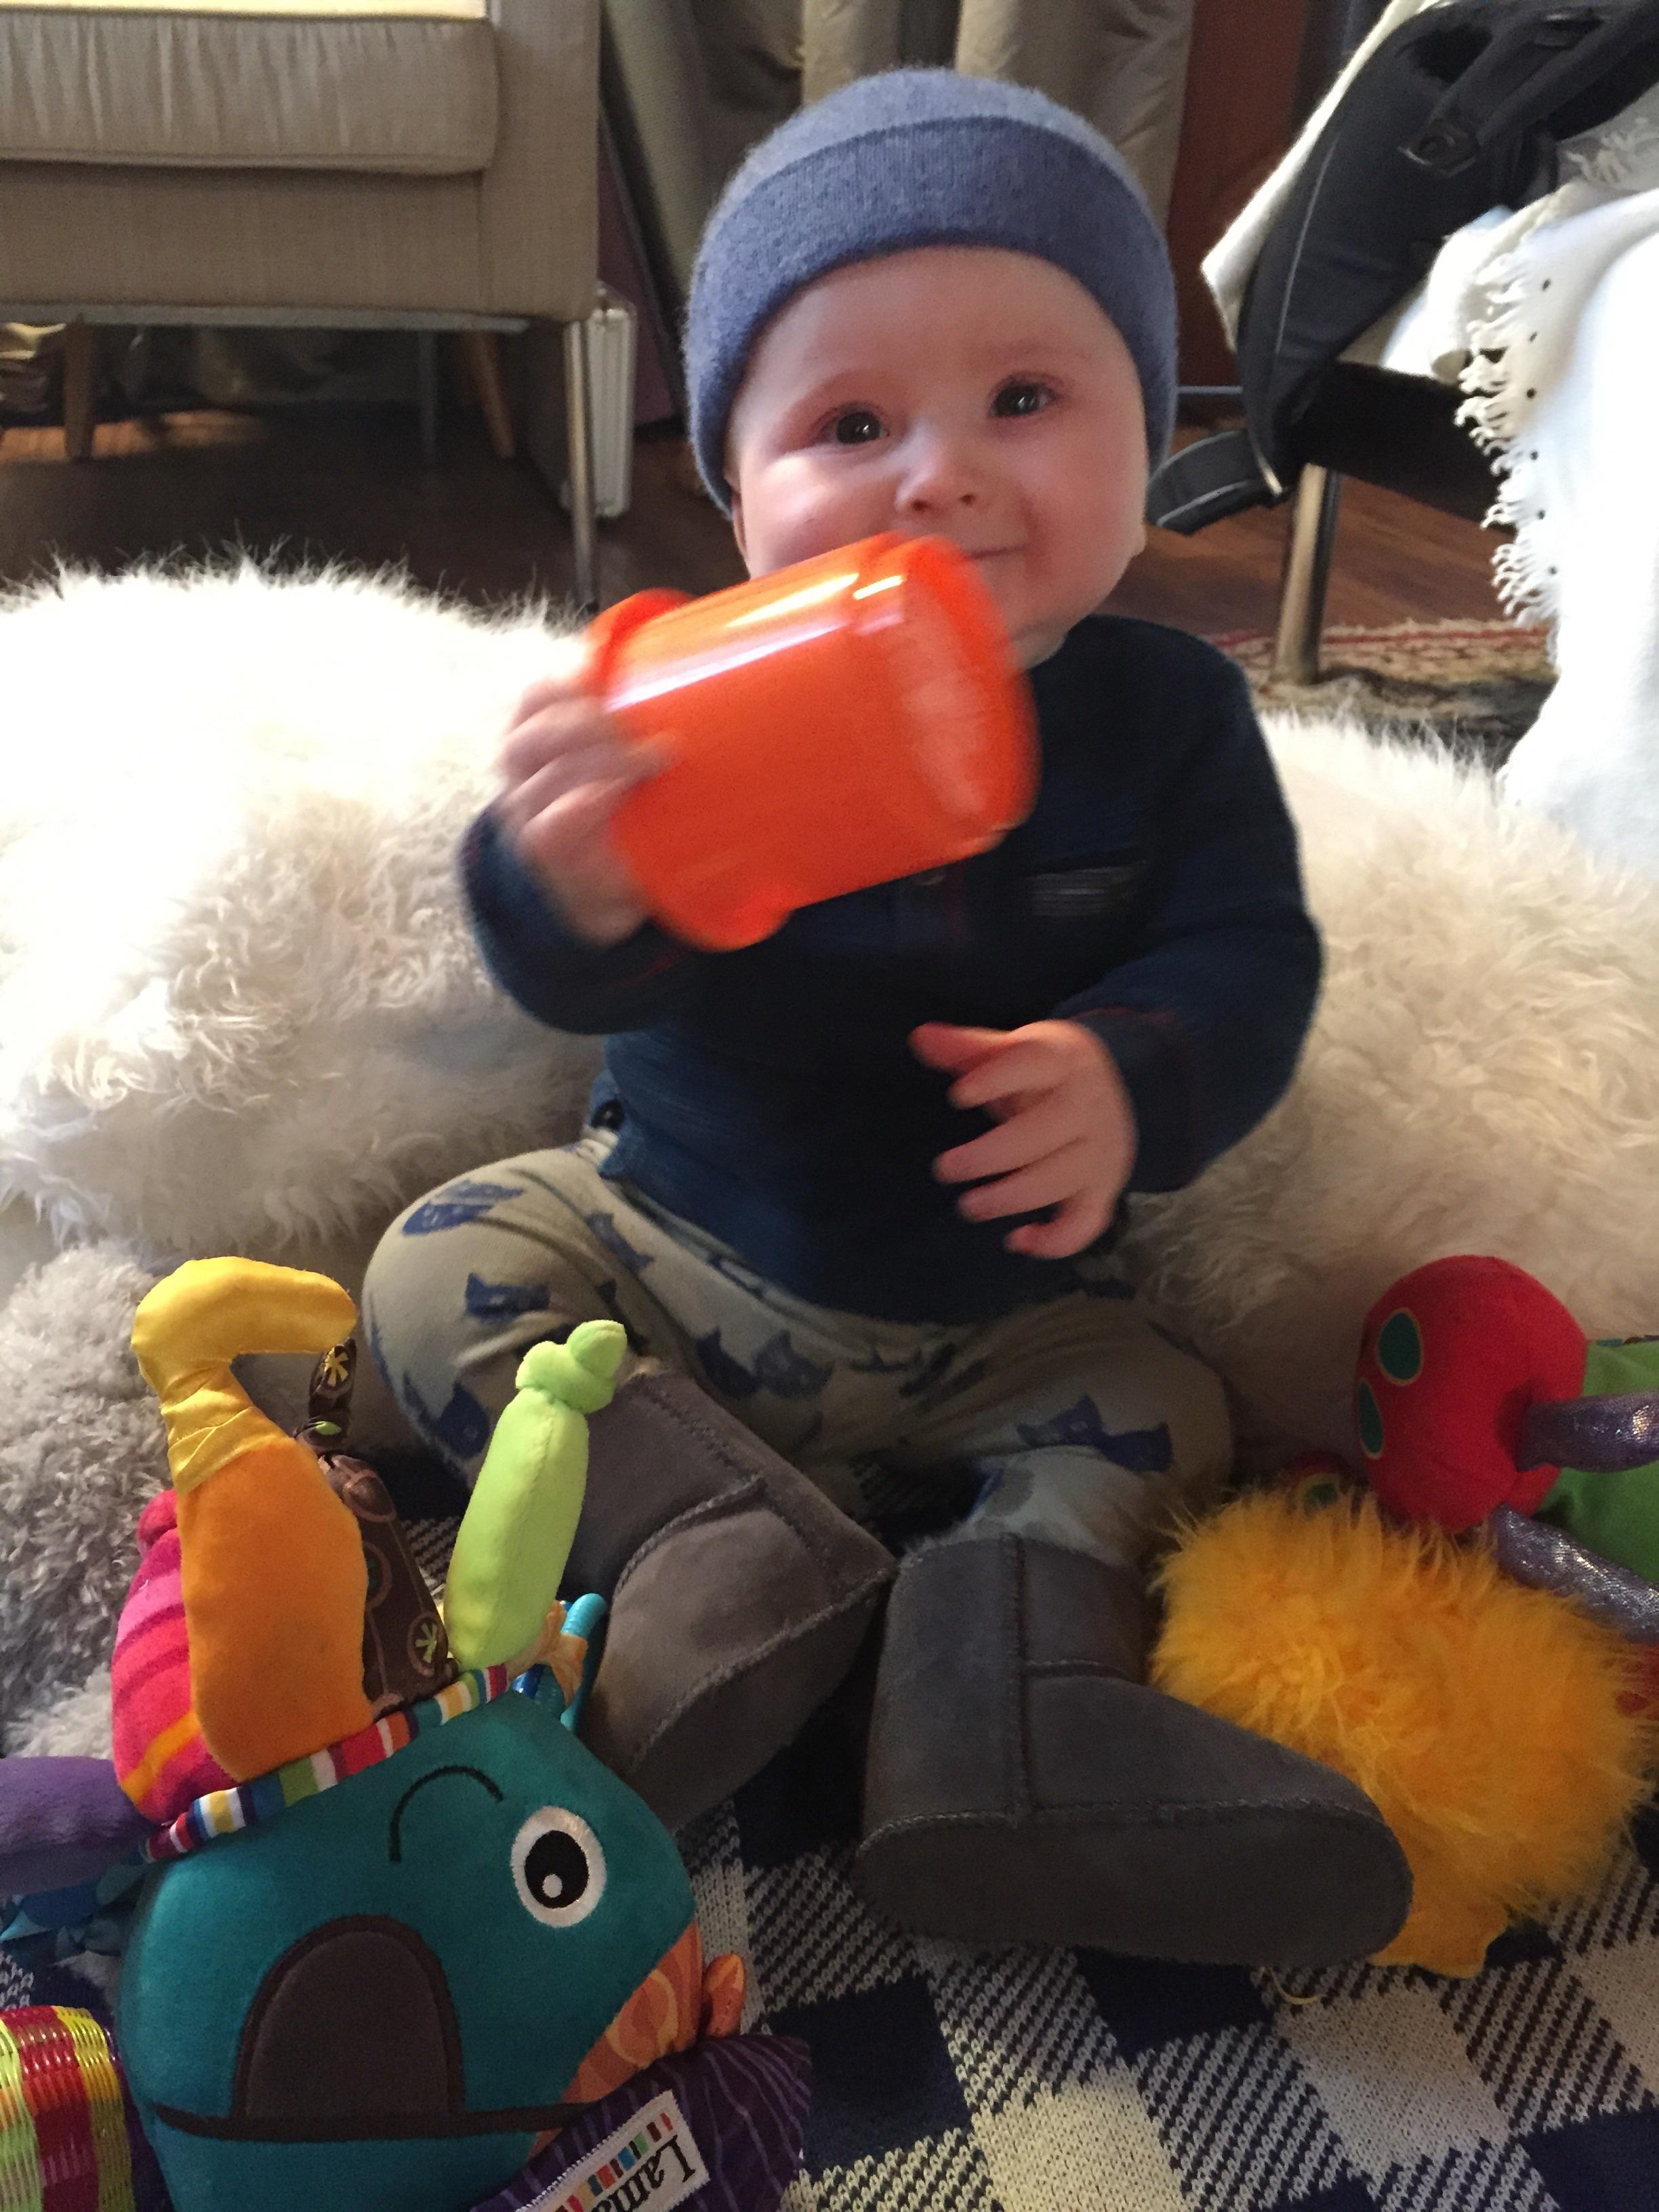 Orange cup is his favorite